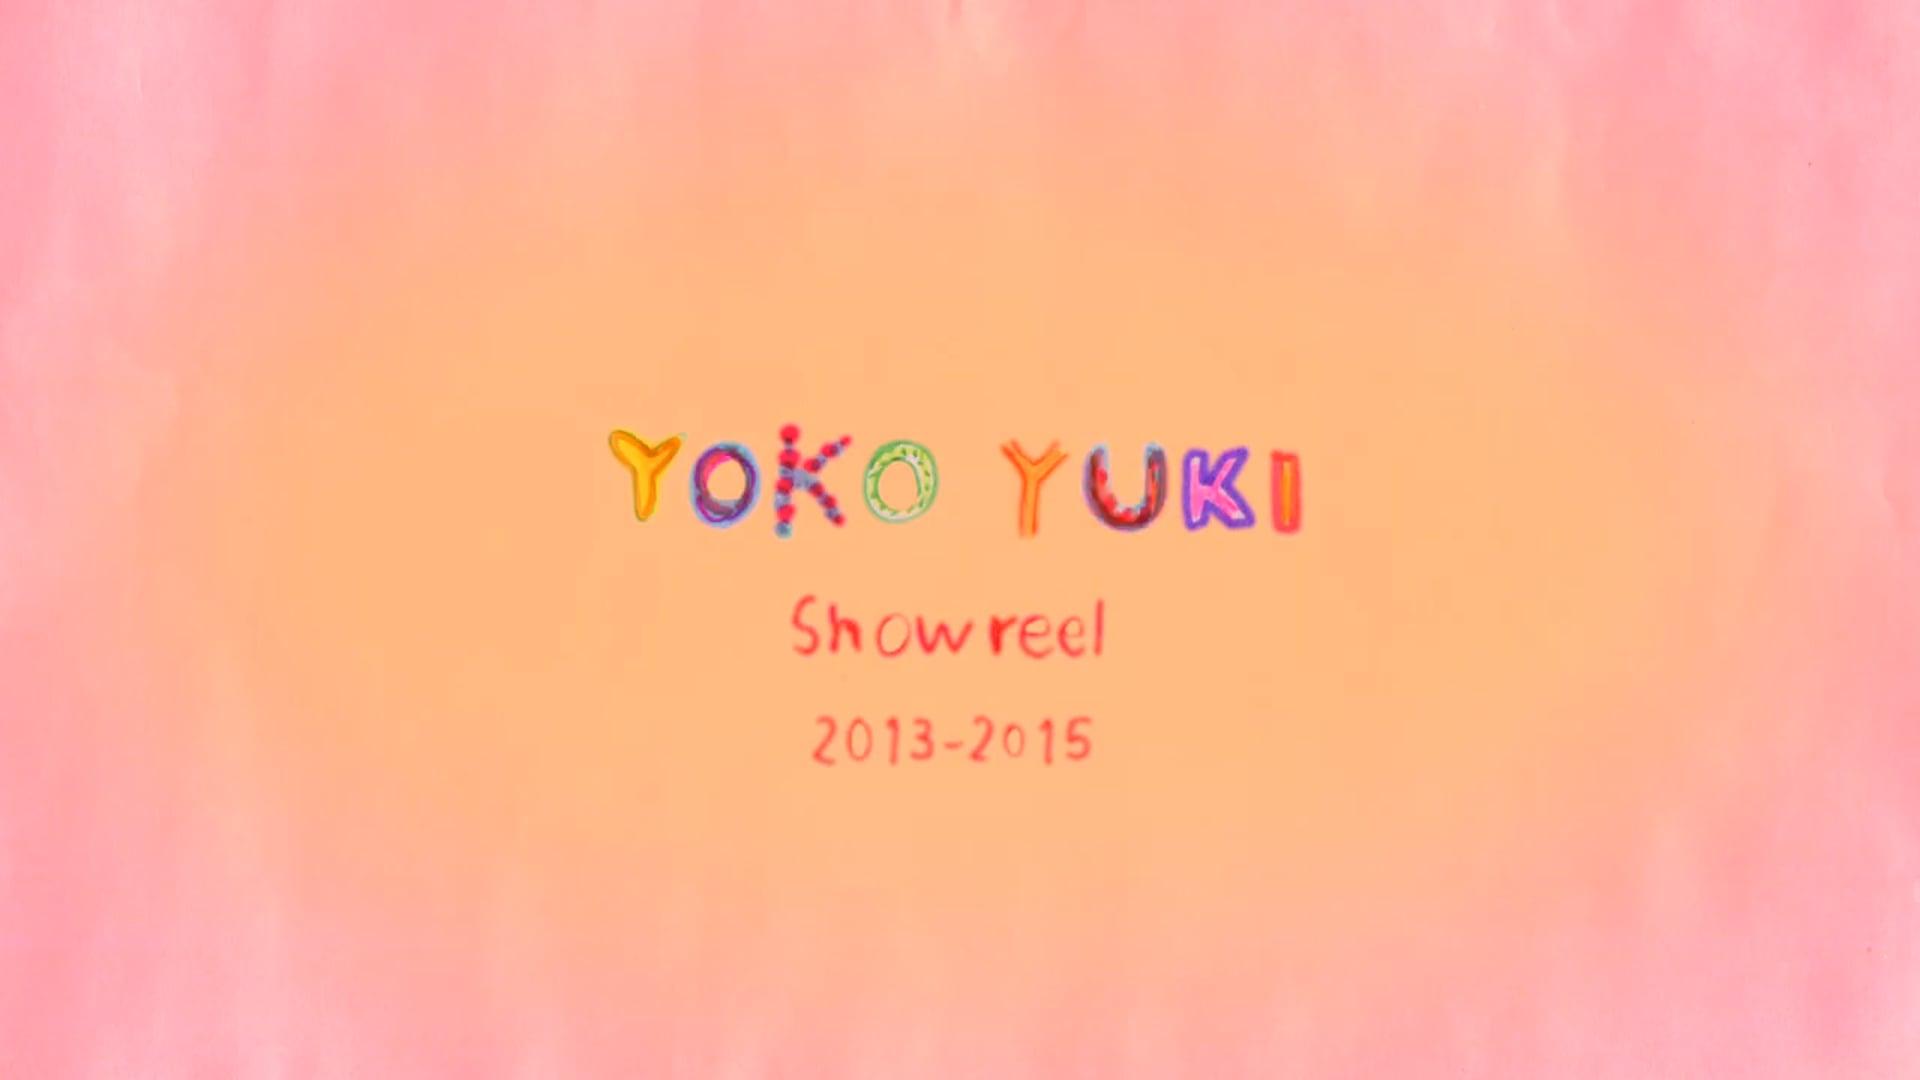 YokoYuki ShowReel 2013-2015